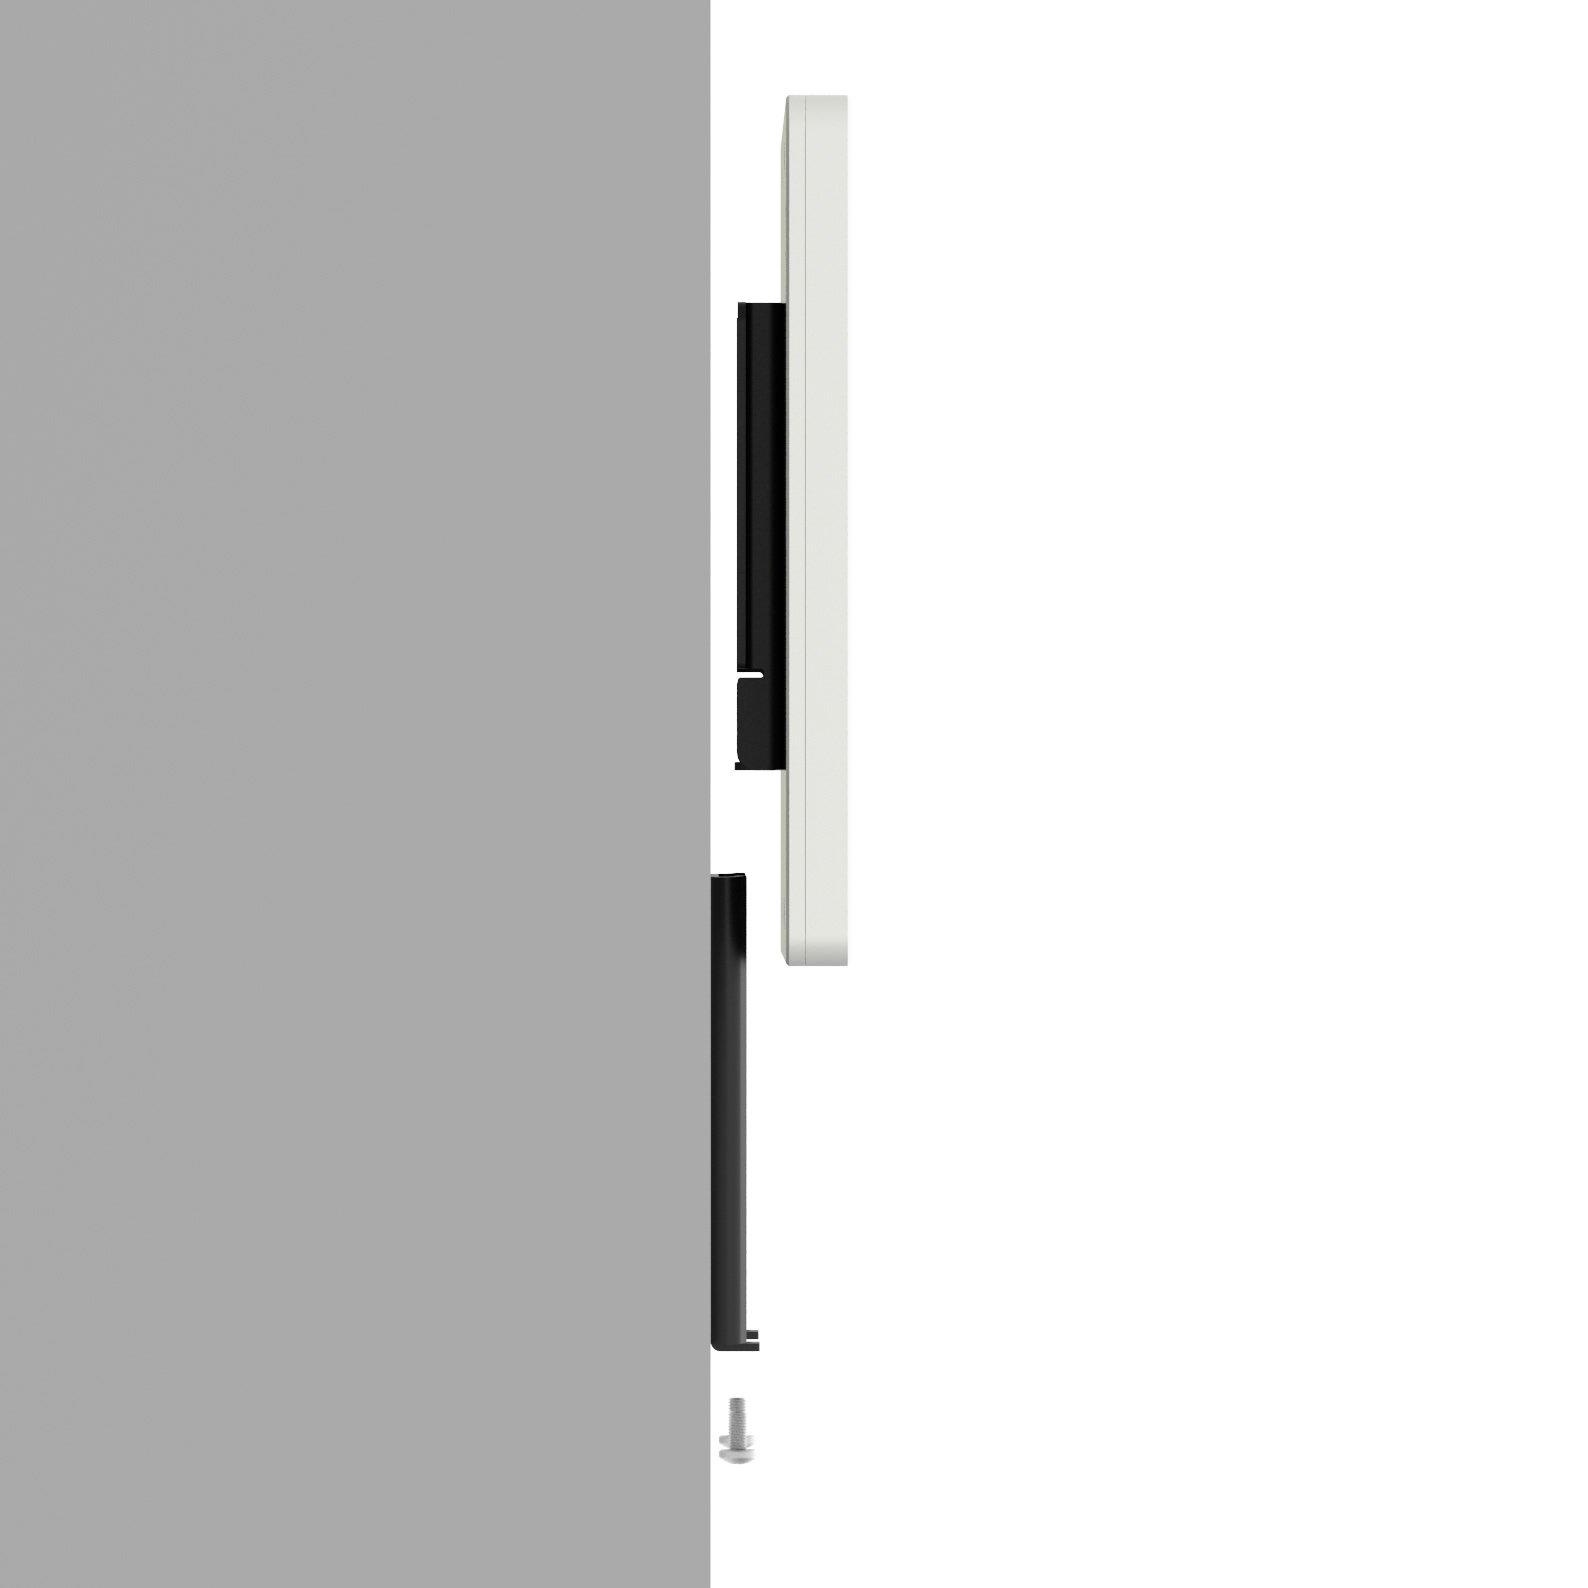 iPad (5th Gen) 9.7/Pro, Air 1/2 White Home Button Covered Fixed Slim VESA Wall Mount [Bundle] by VidaBox Kiosks (Image #4)